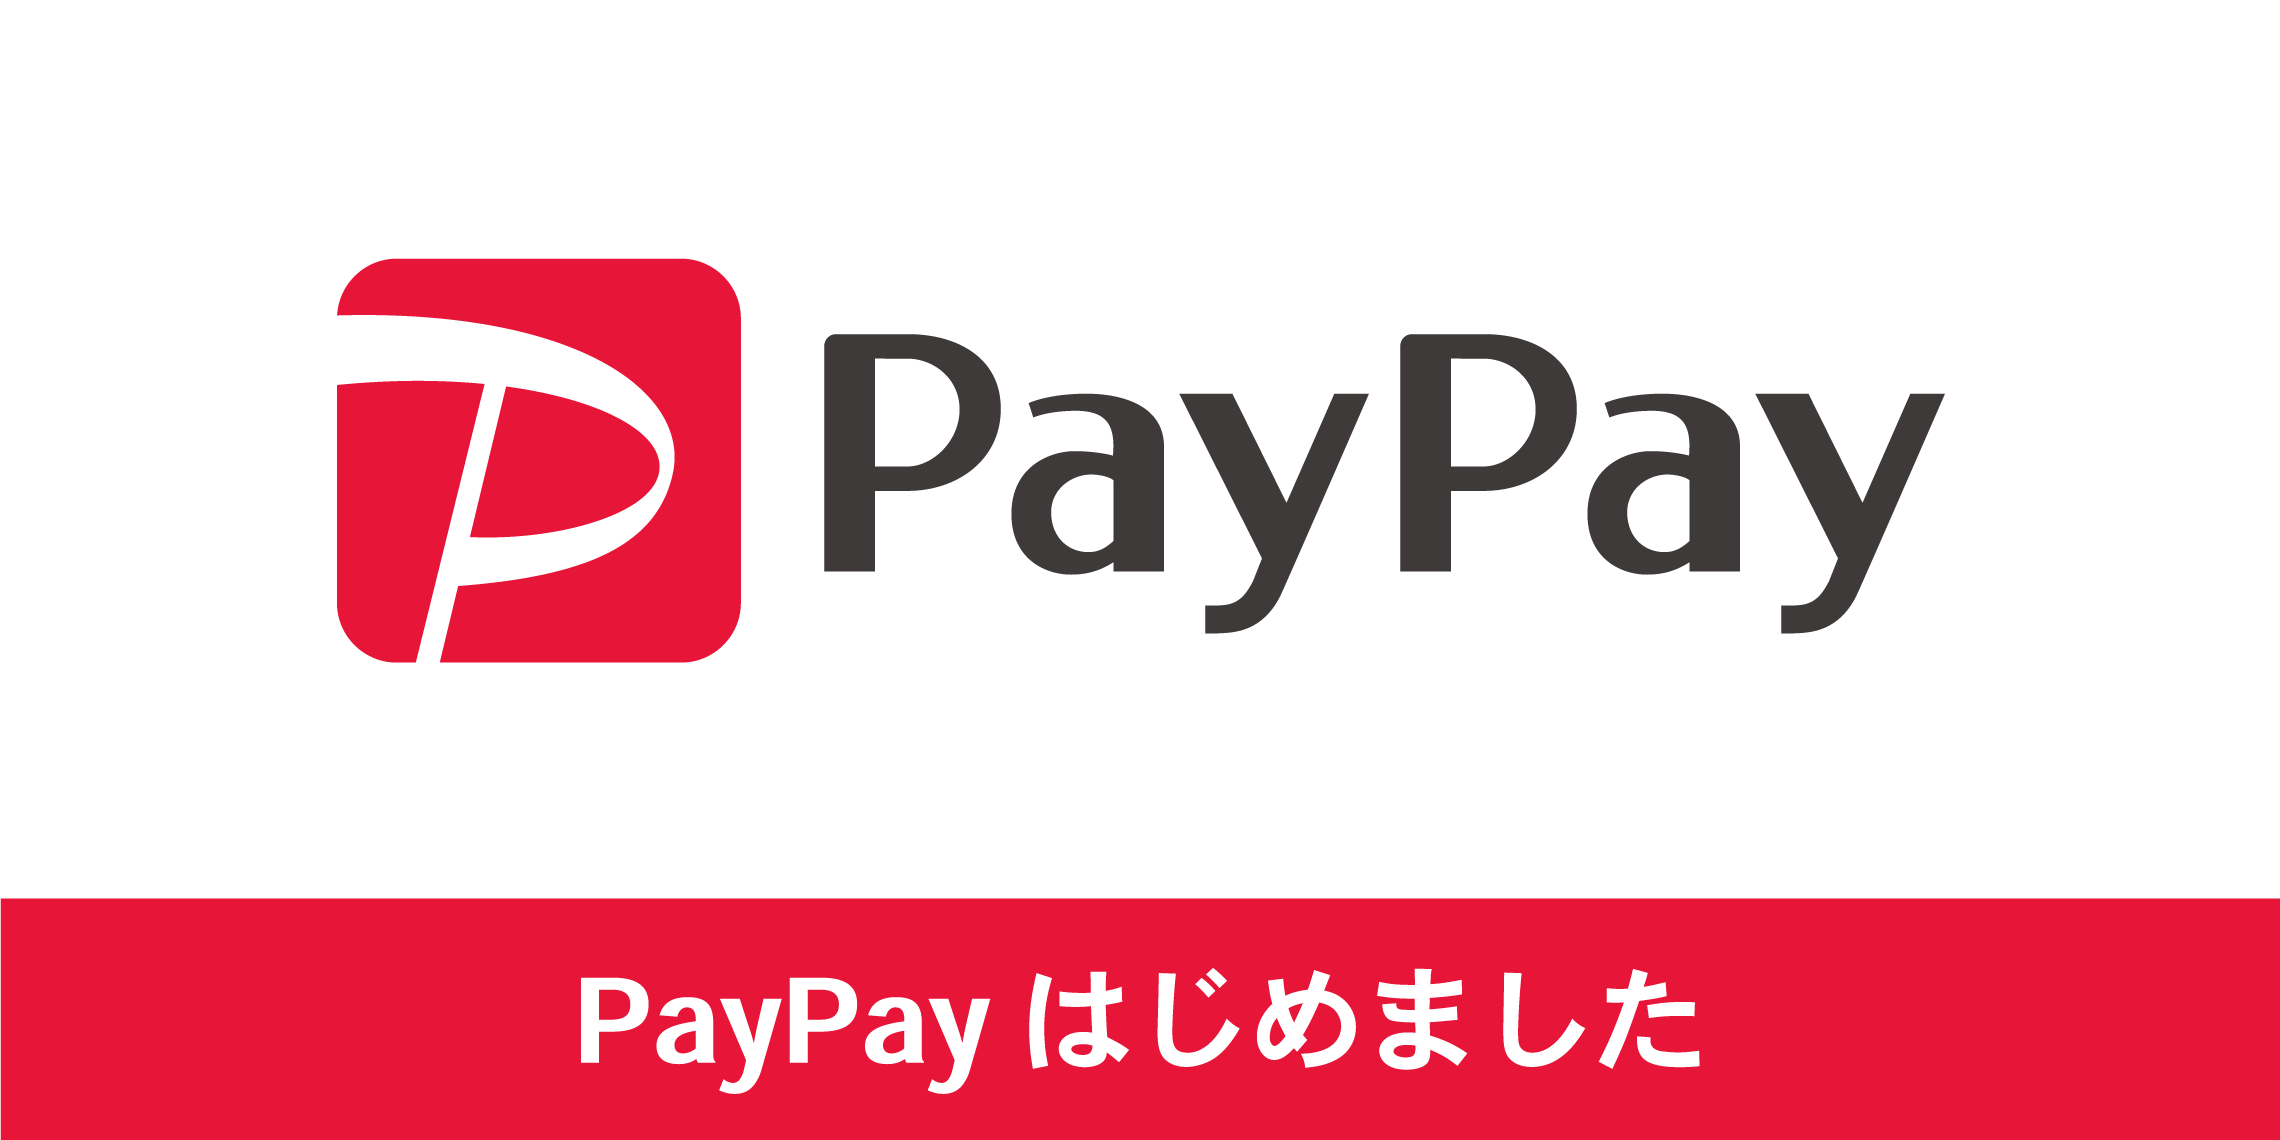 Paypay始めました 奄美大島観光タクシー